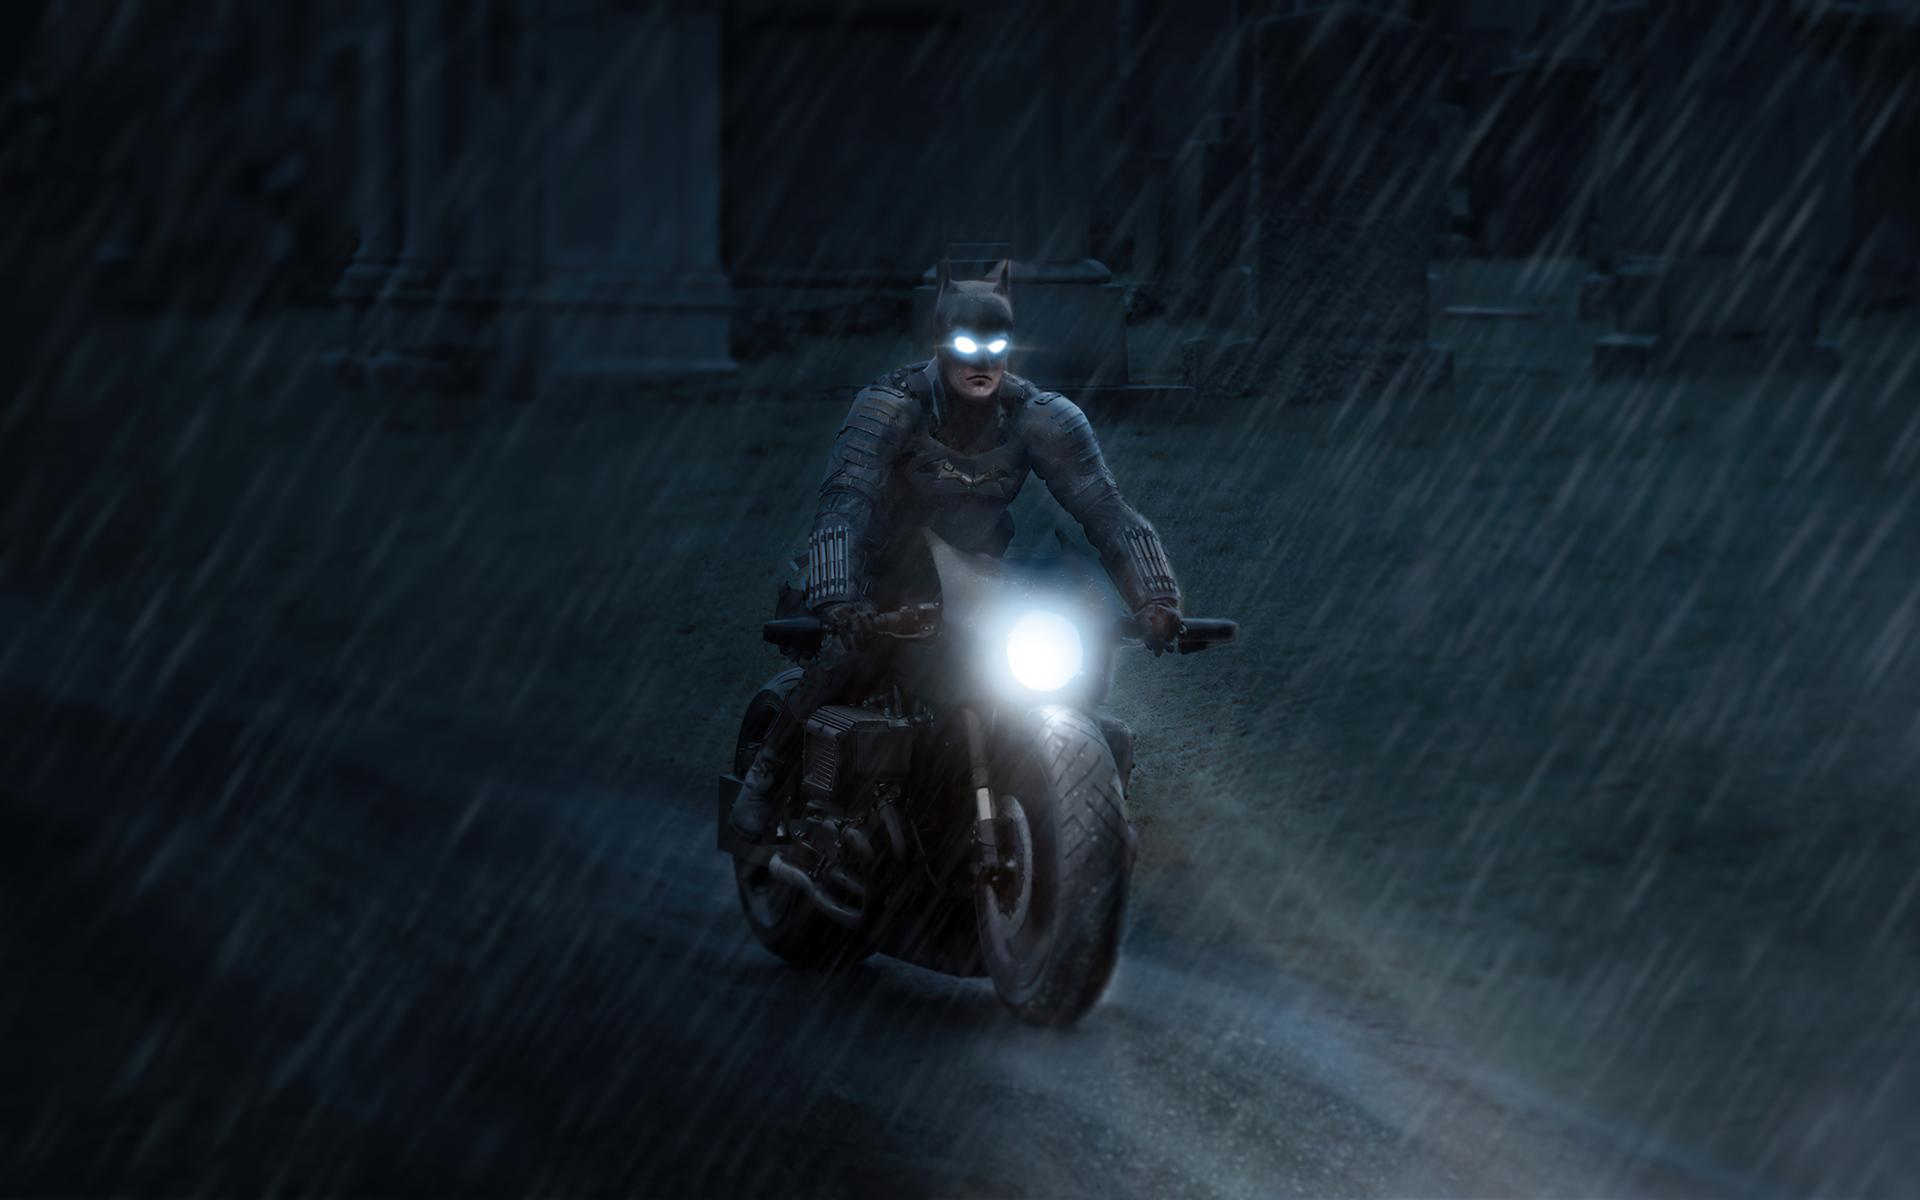 1920x1200 Batman Robert Pattinson On Bike 4k 1080P ...